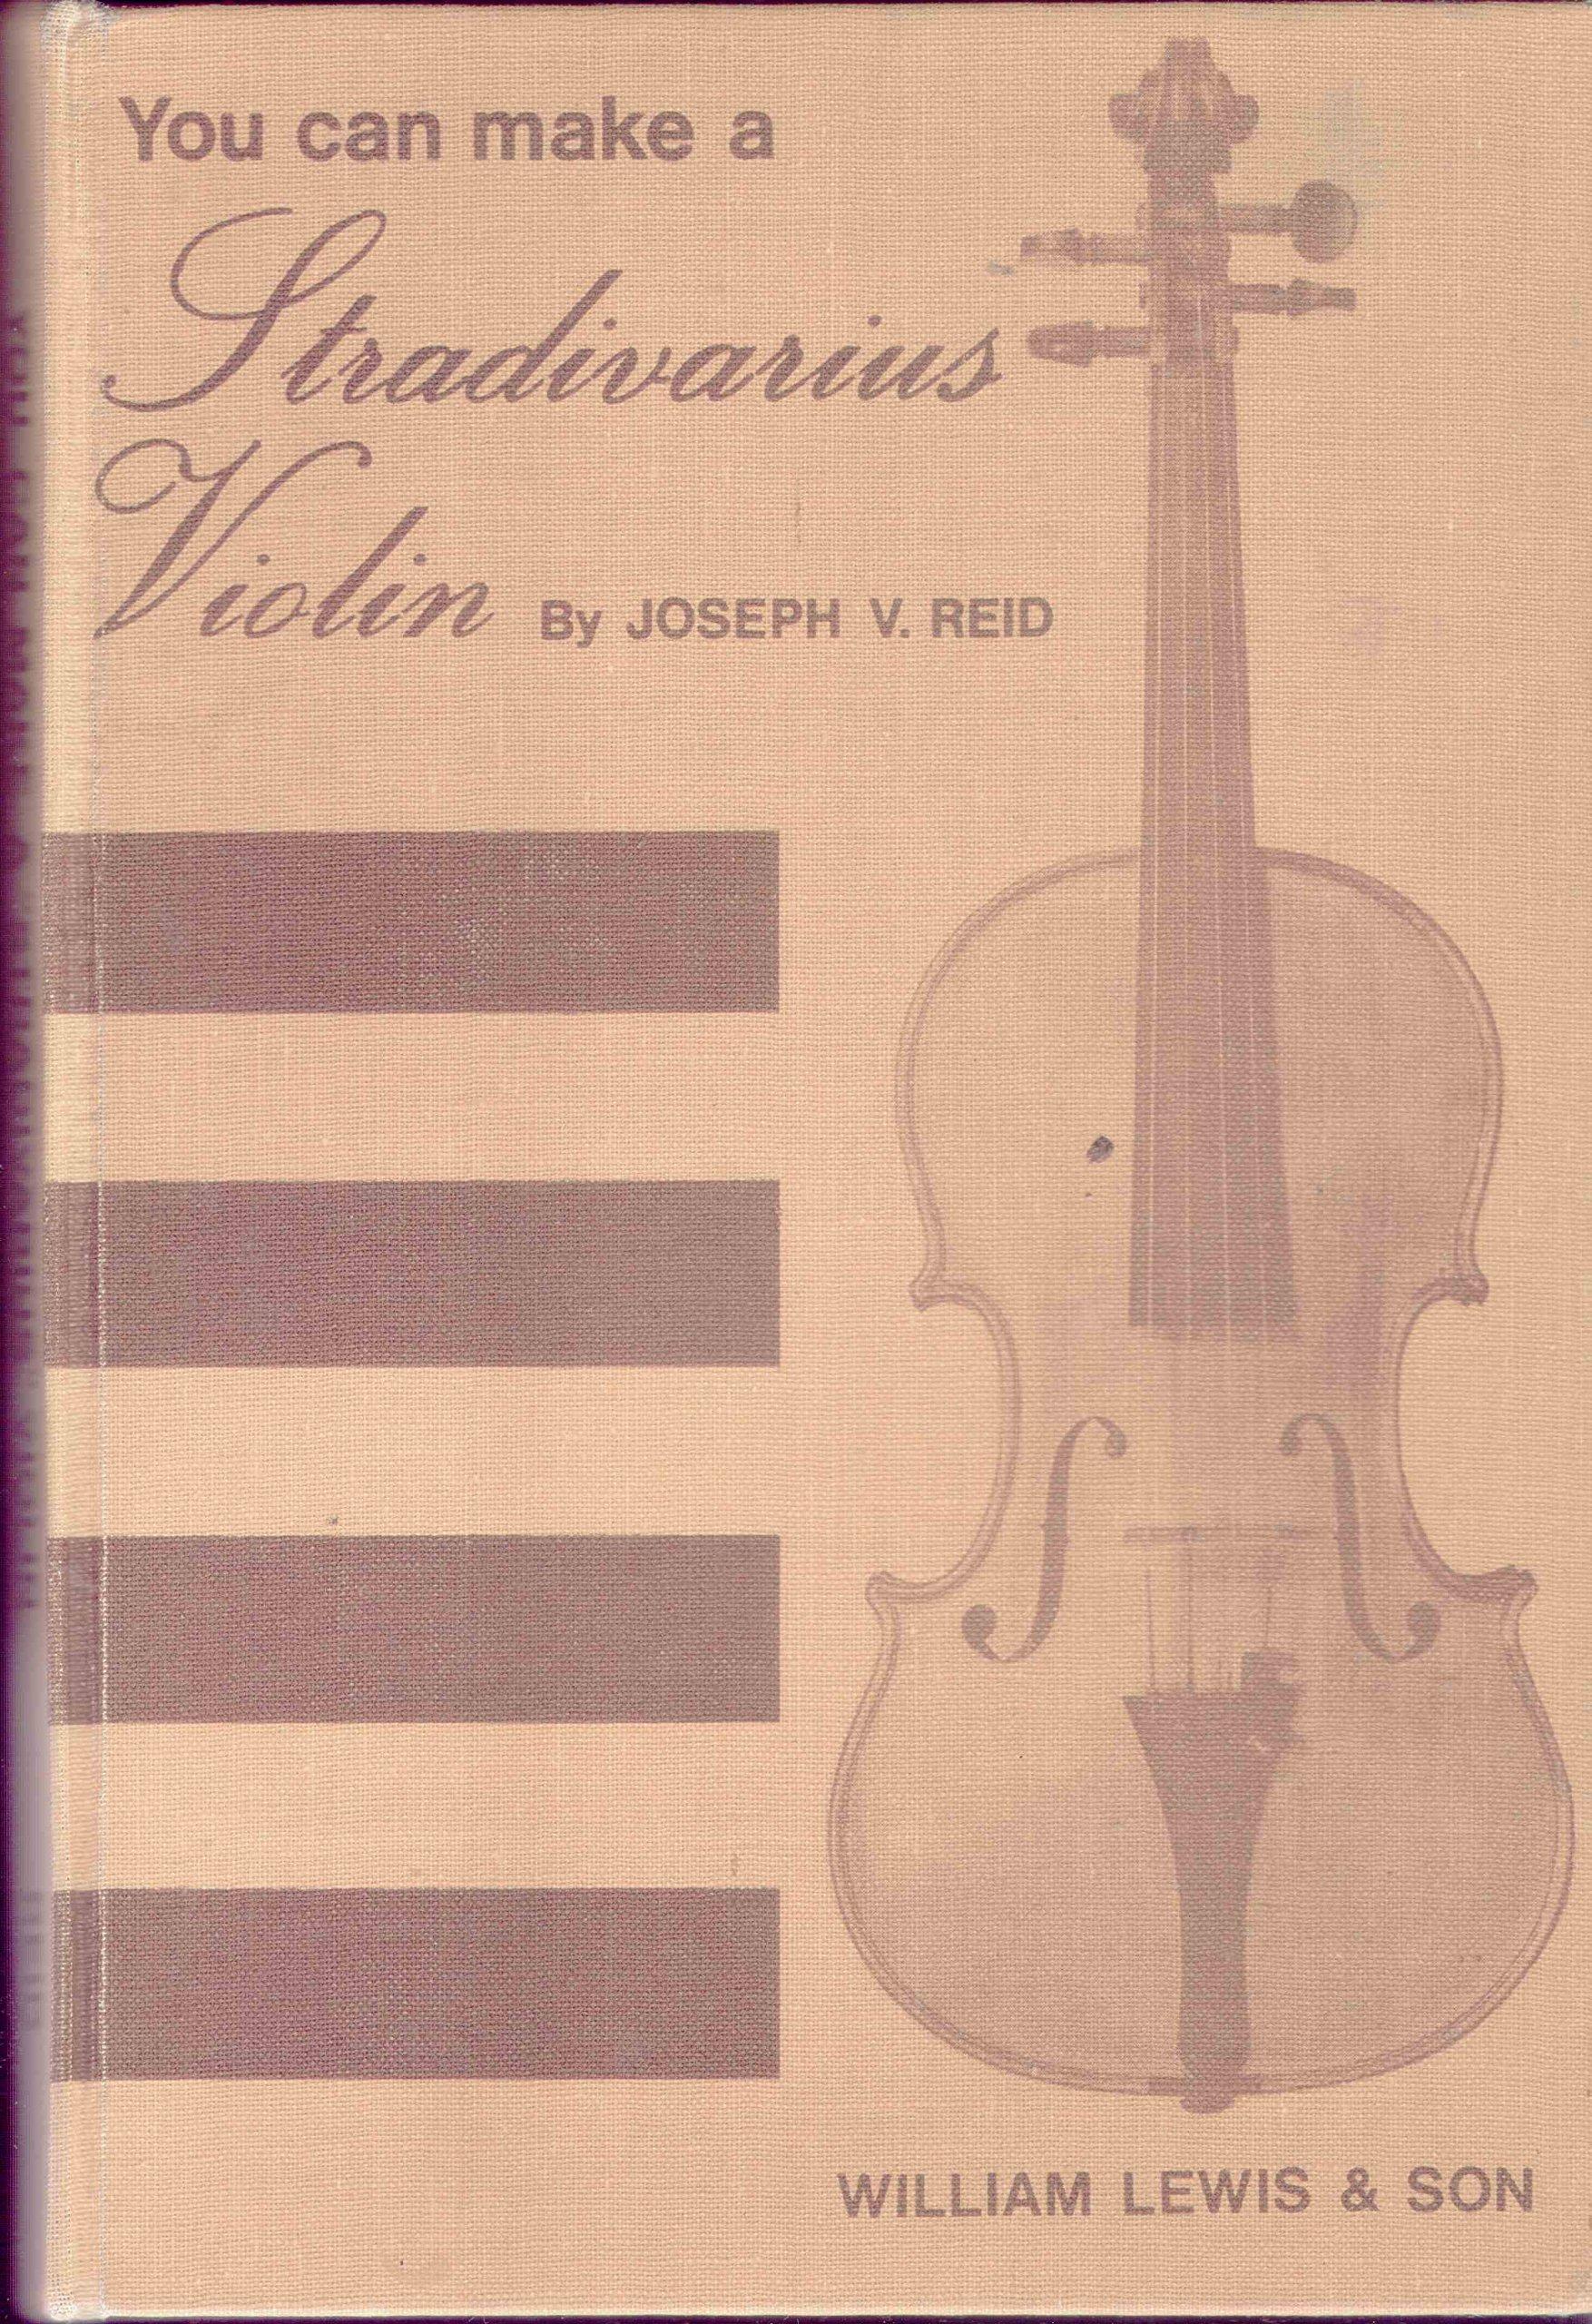 You Can Make a Stradivarius Violin: Joseph V. Reid: Amazon ...